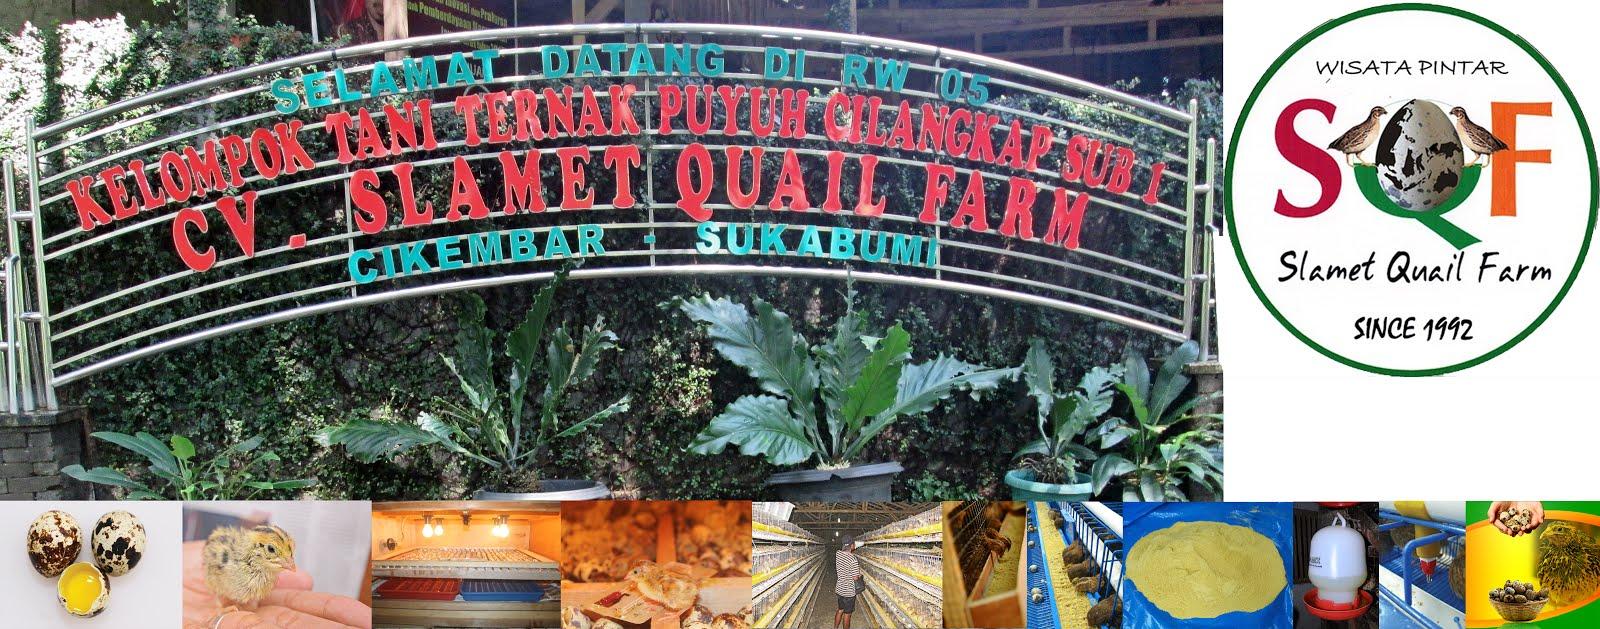 CV Slamet Quail Farm Sukabumi